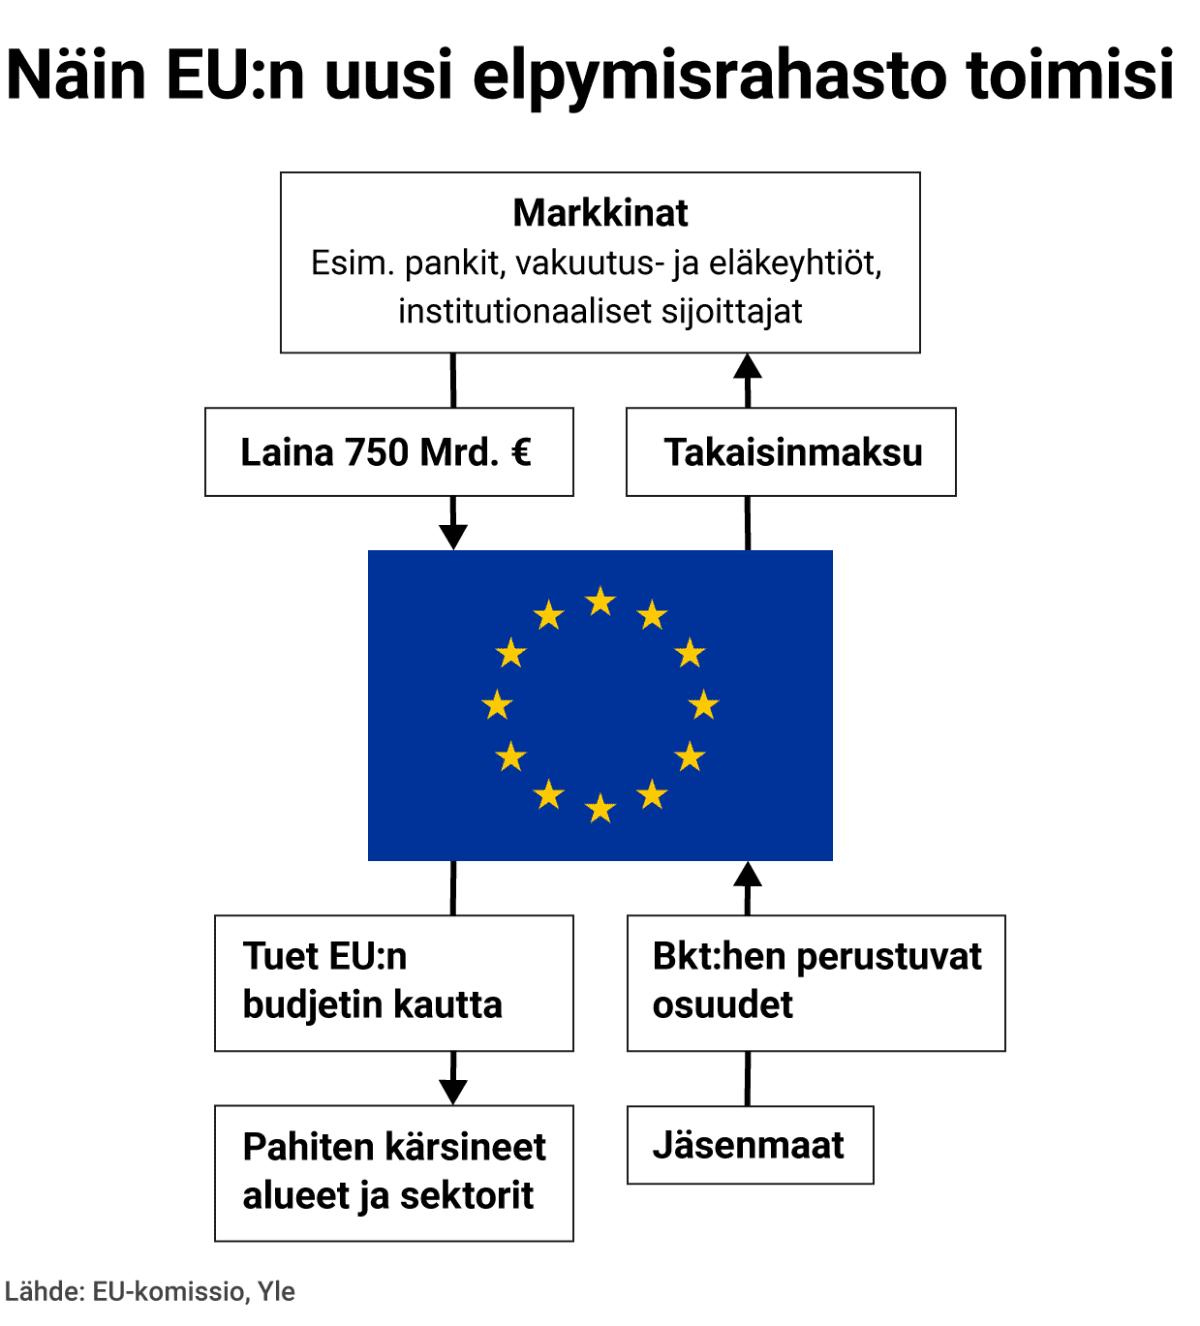 Näin EU:n uusi elpymisrahasto toimisi